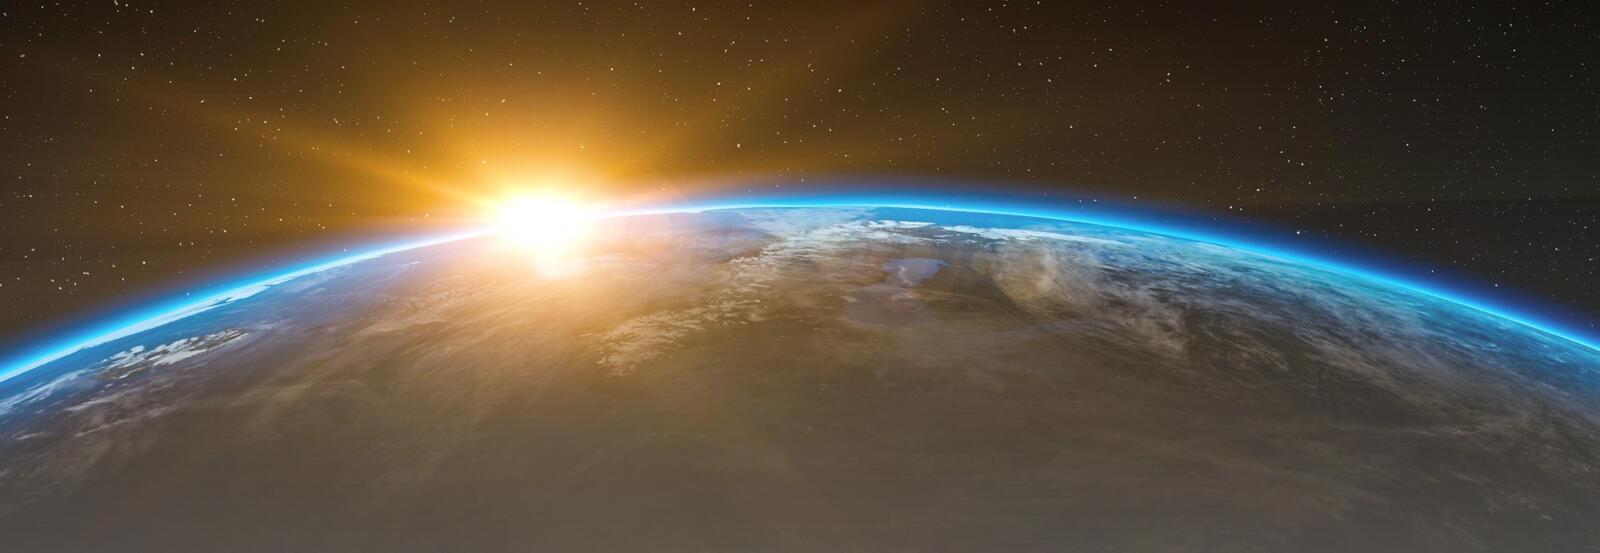 Sun rising over Earth.